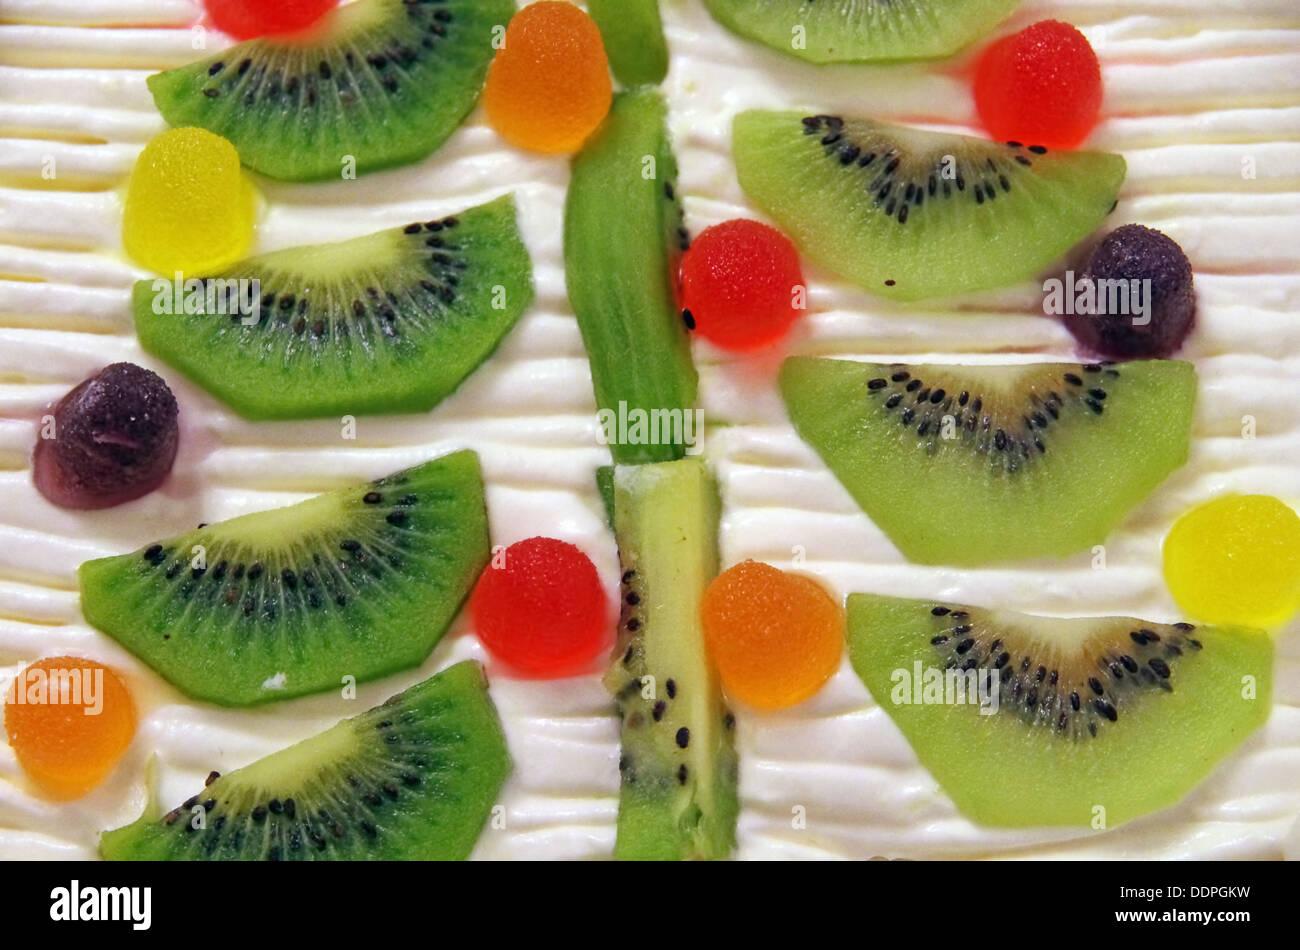 Cake with kiwi fruit, as a background - Stock Image